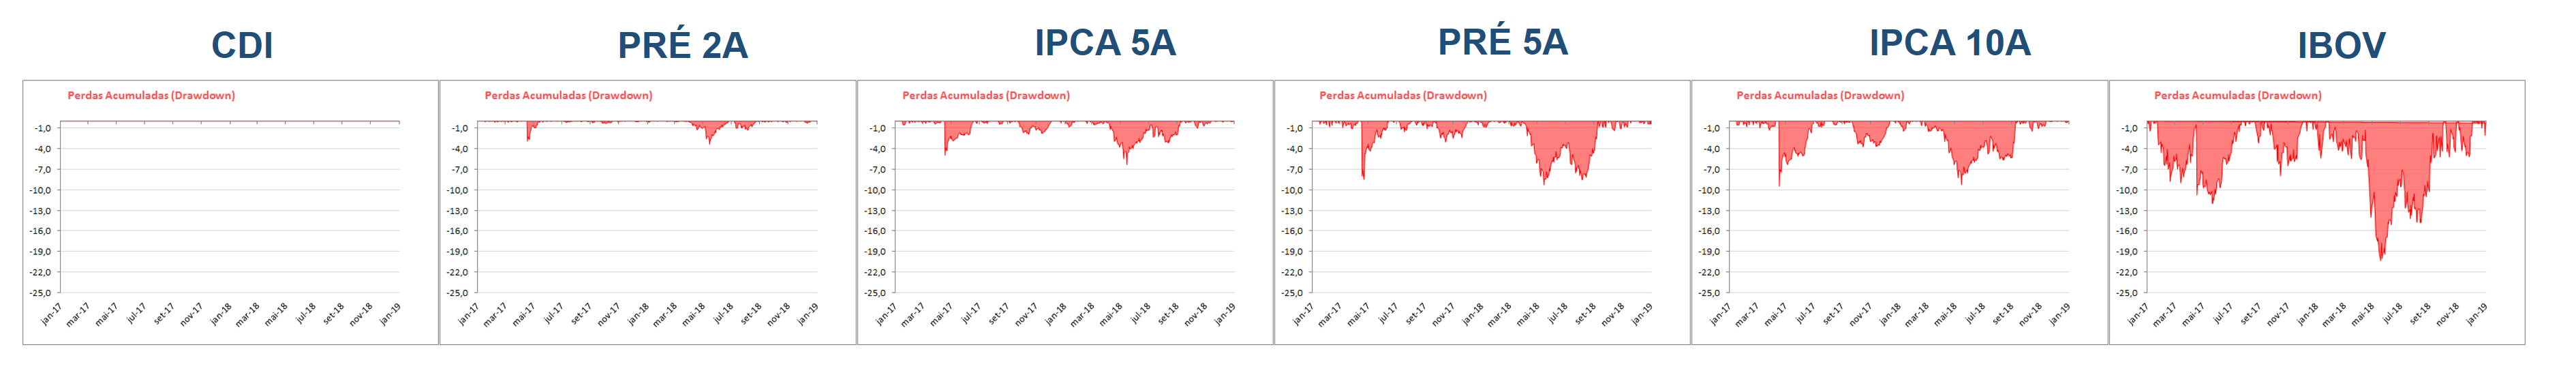 drawdown cdi prefixado ipca e ibovespa maxima perda acumulada no periodo